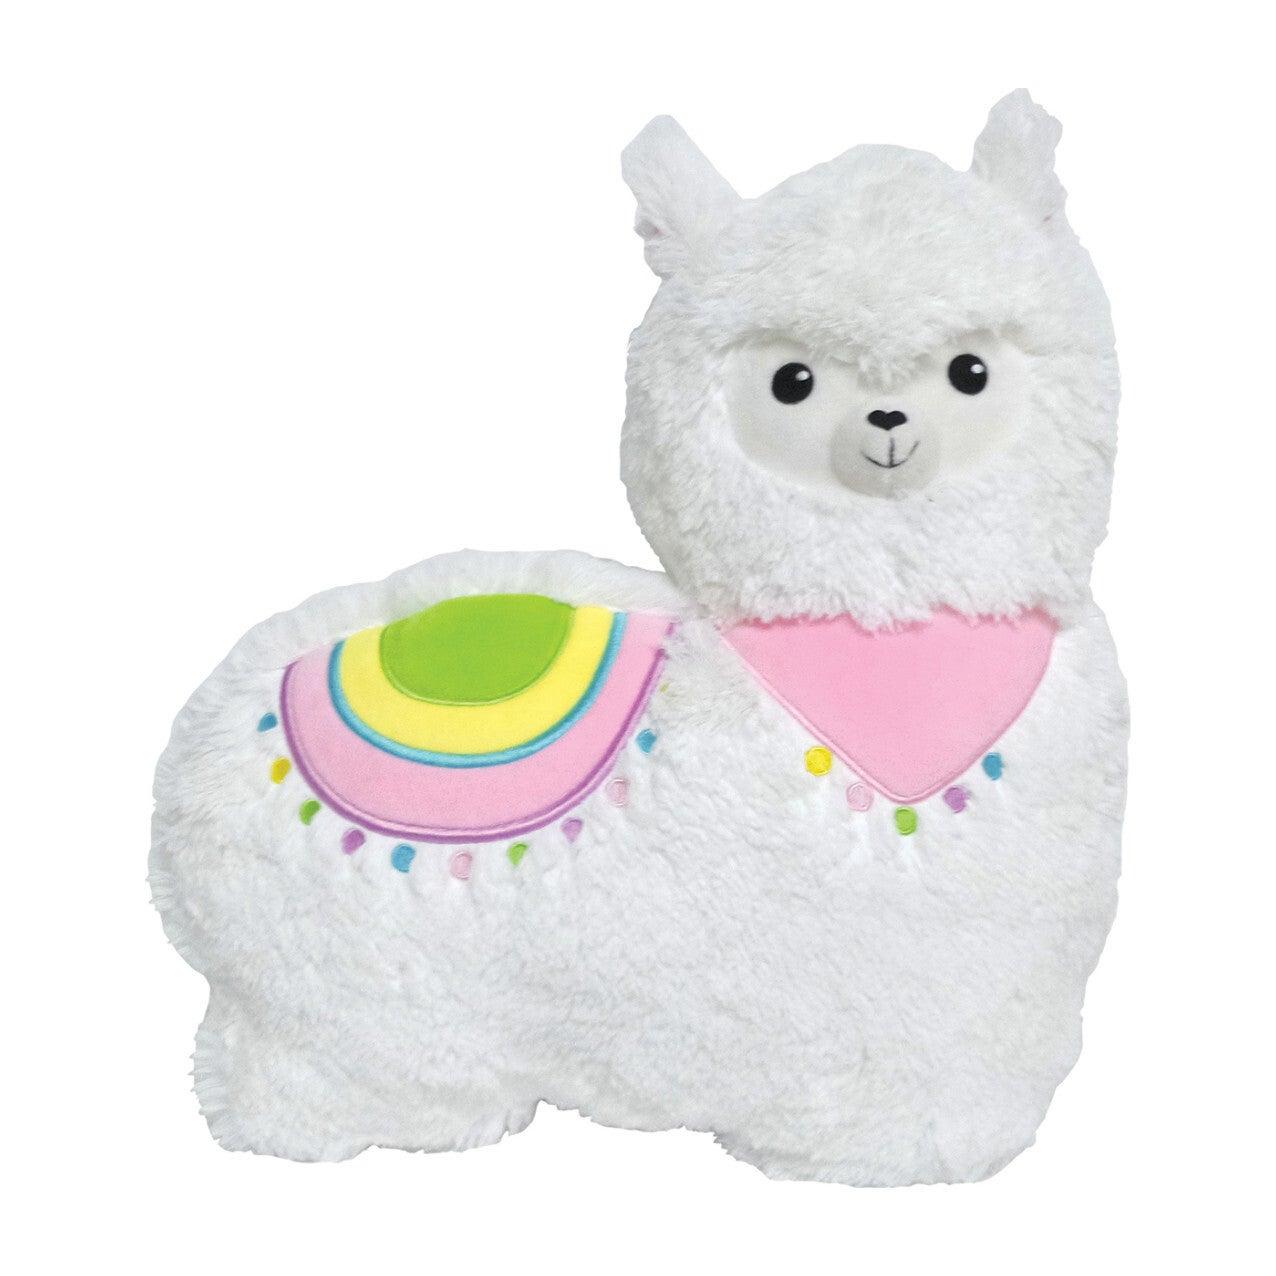 Llama Furry Pillow, White